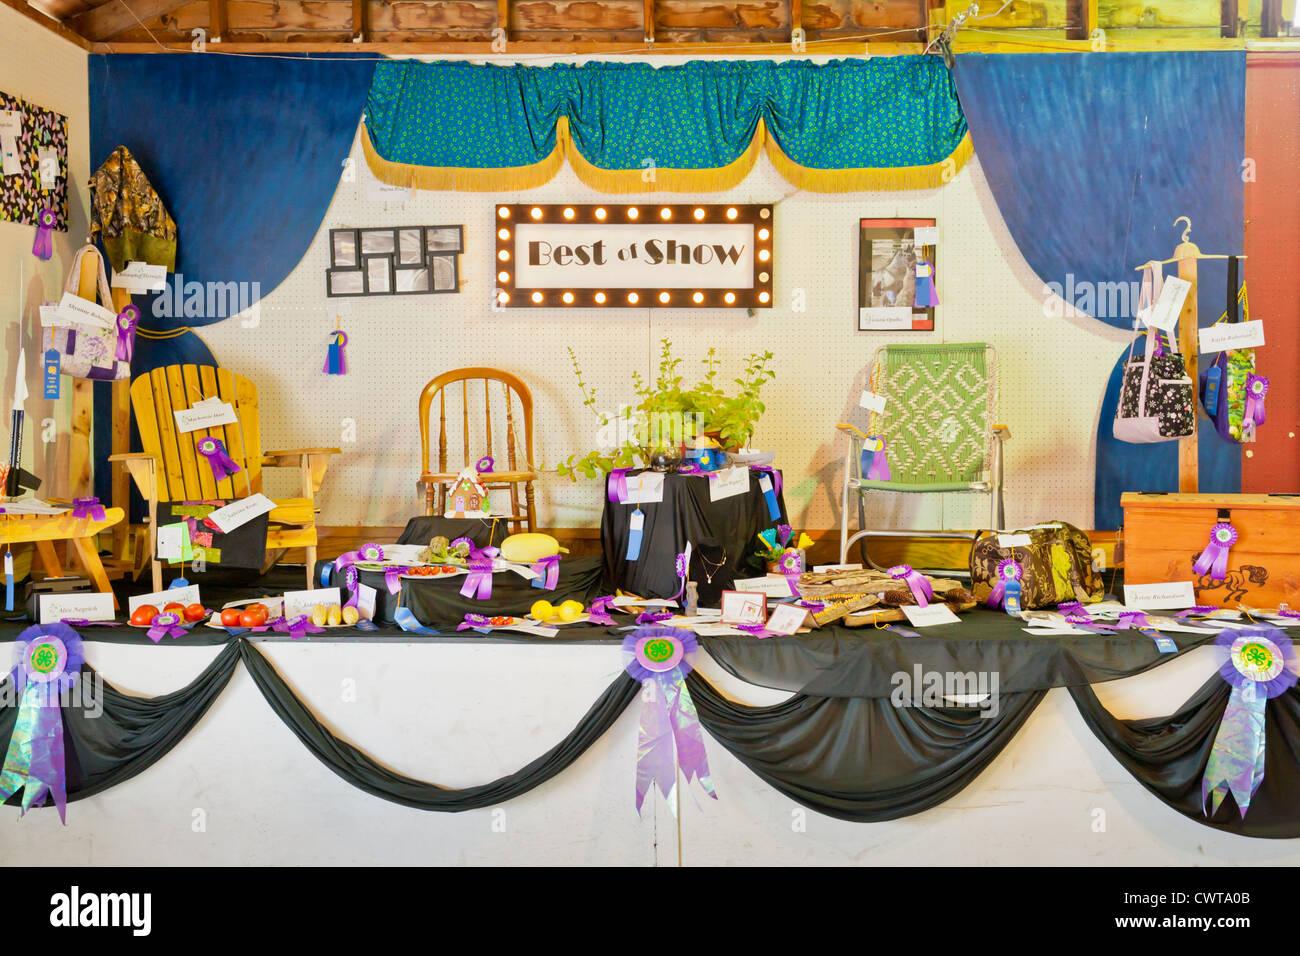 New york montgomery county fonda - Best Of Show 4h Club Display Fonda Fair Montgomery County New York State